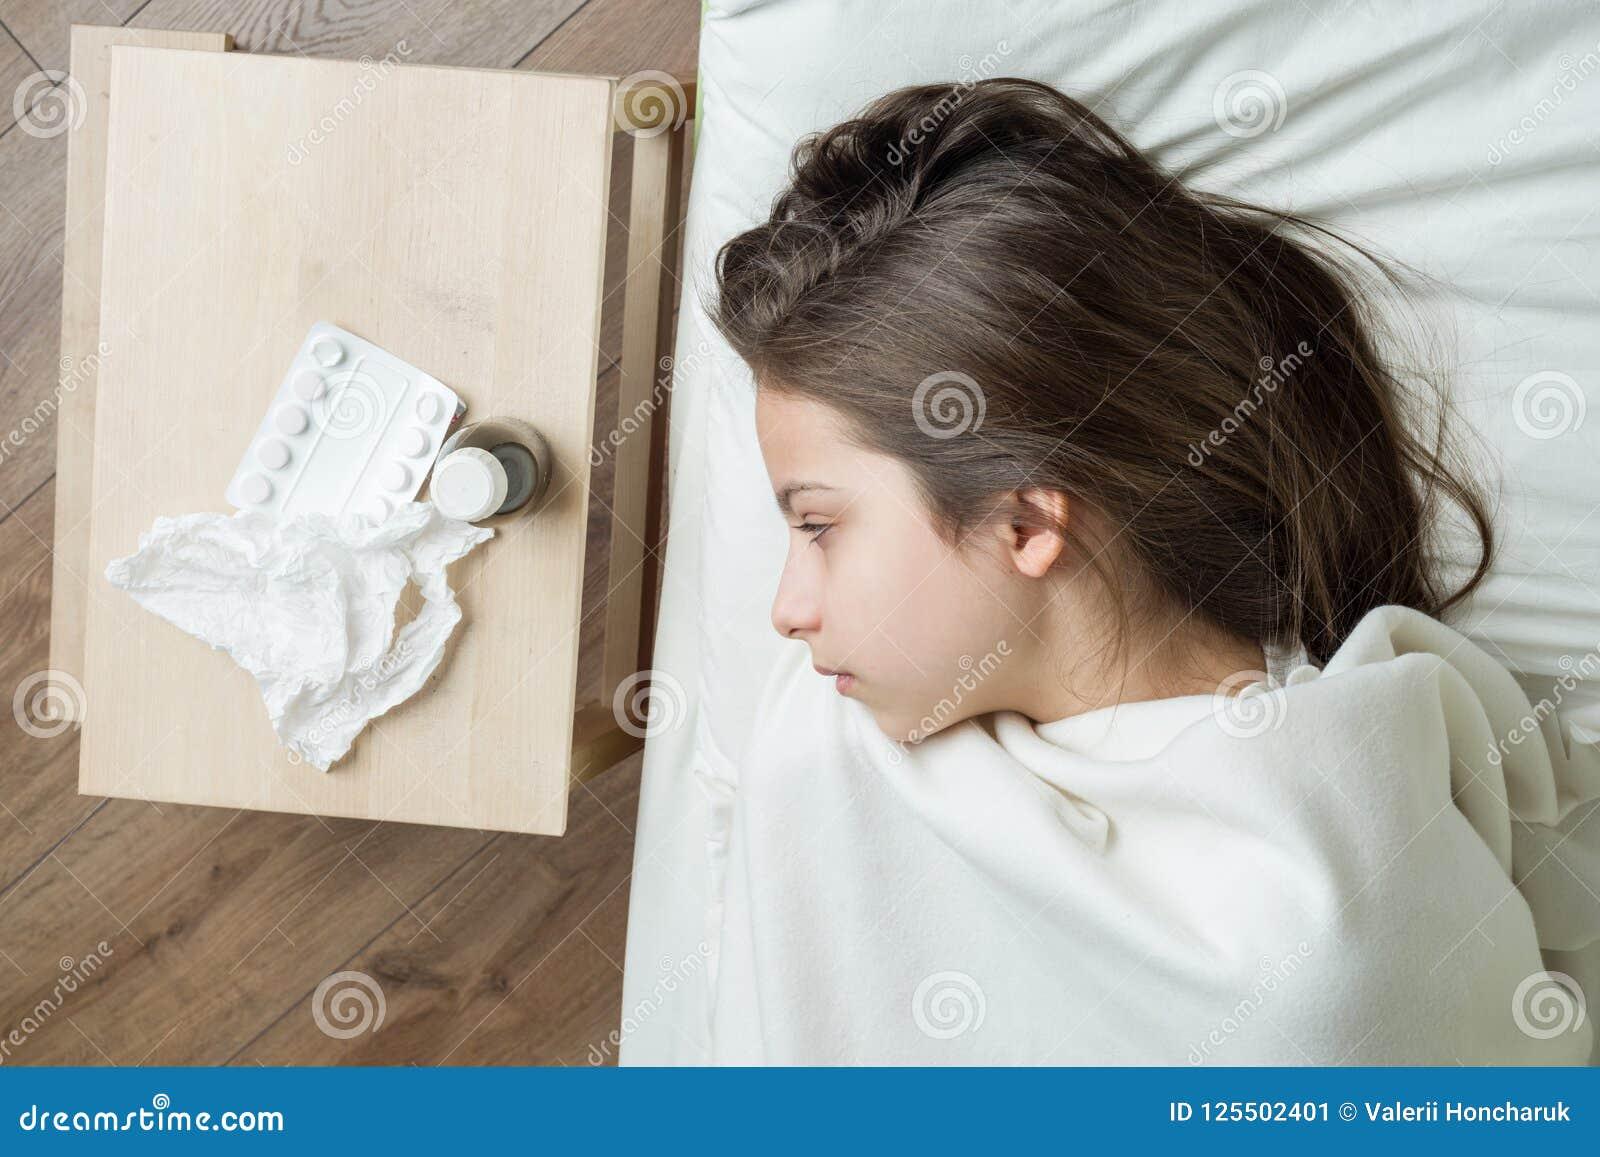 Ребенок в кровати дома уловил холодную, принимающ медицины, сезон гриппа